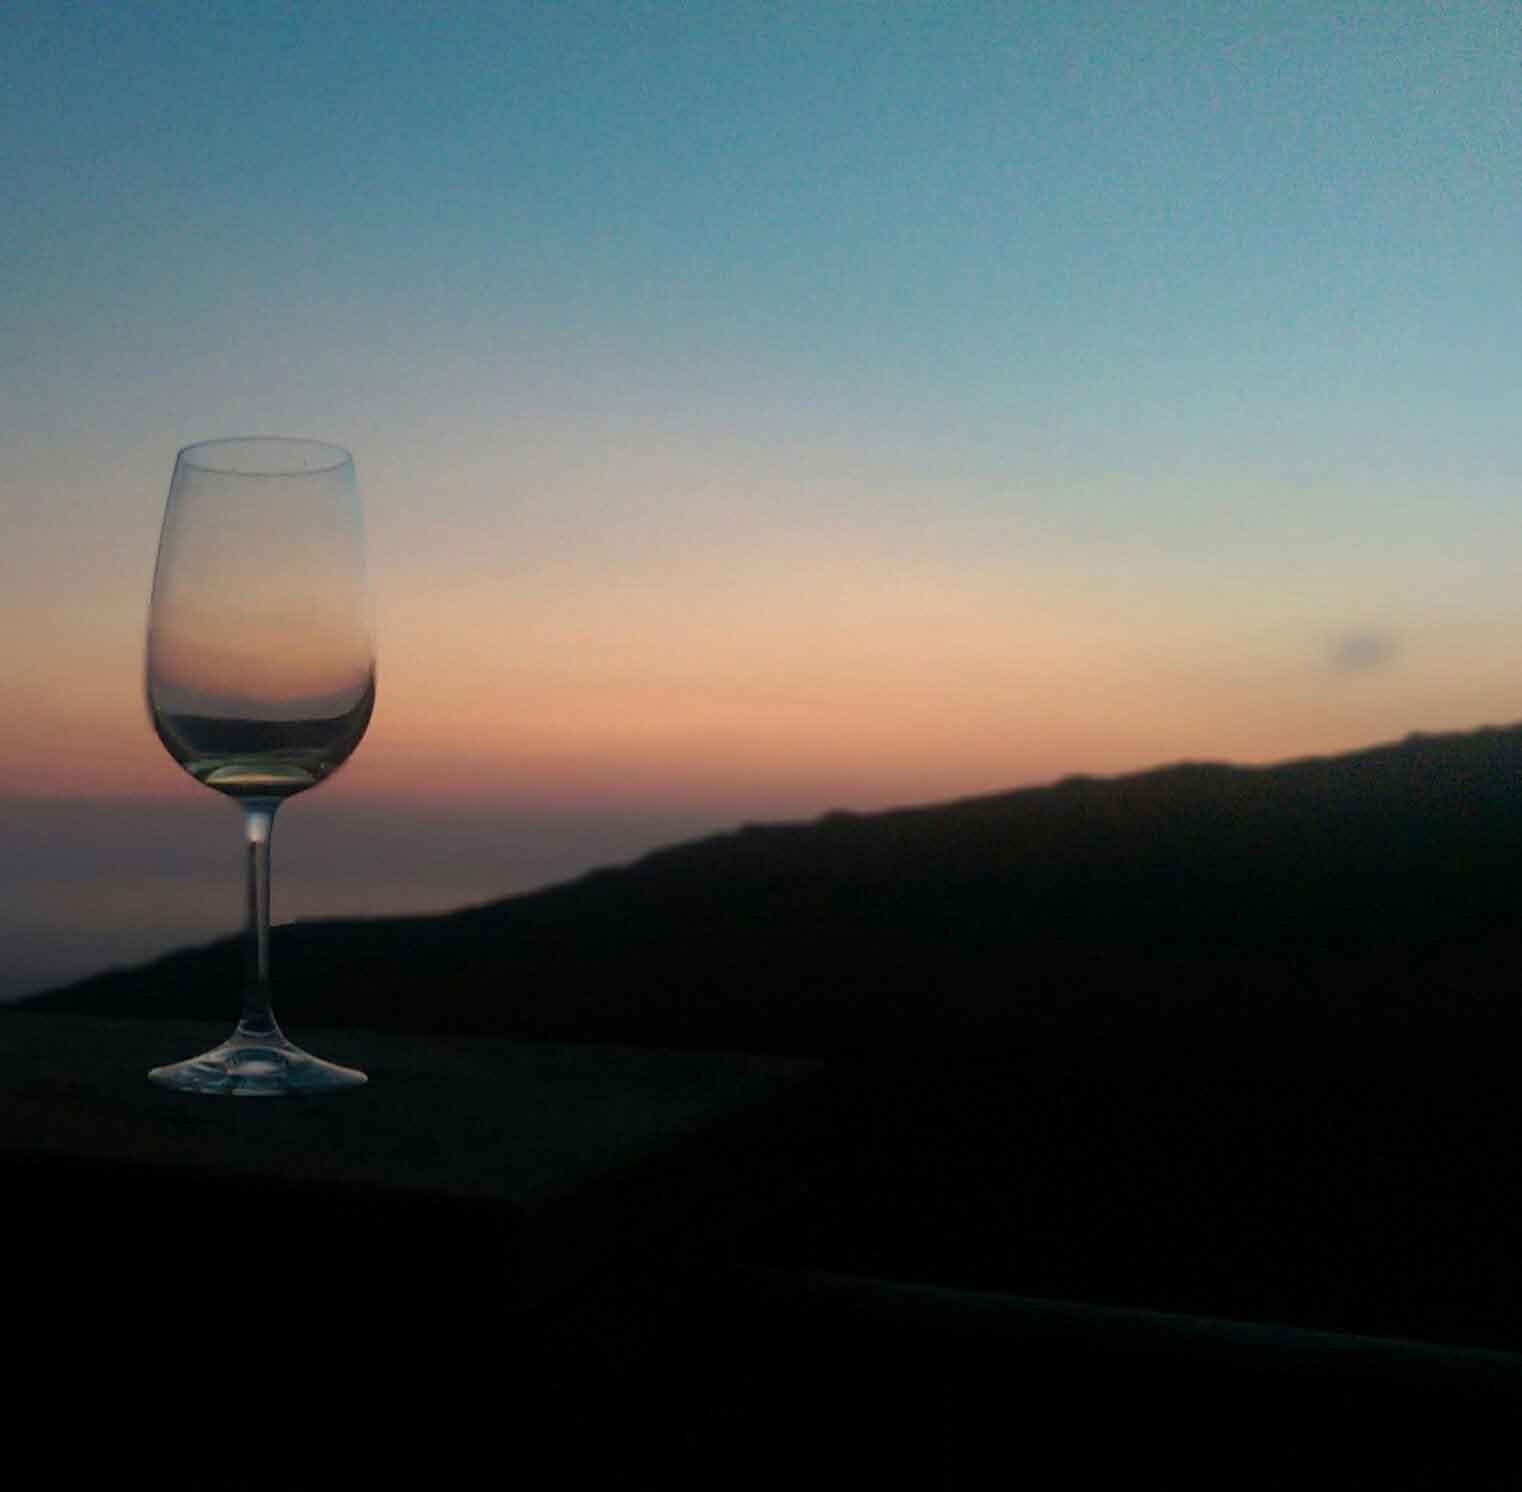 calice vino acciaroli